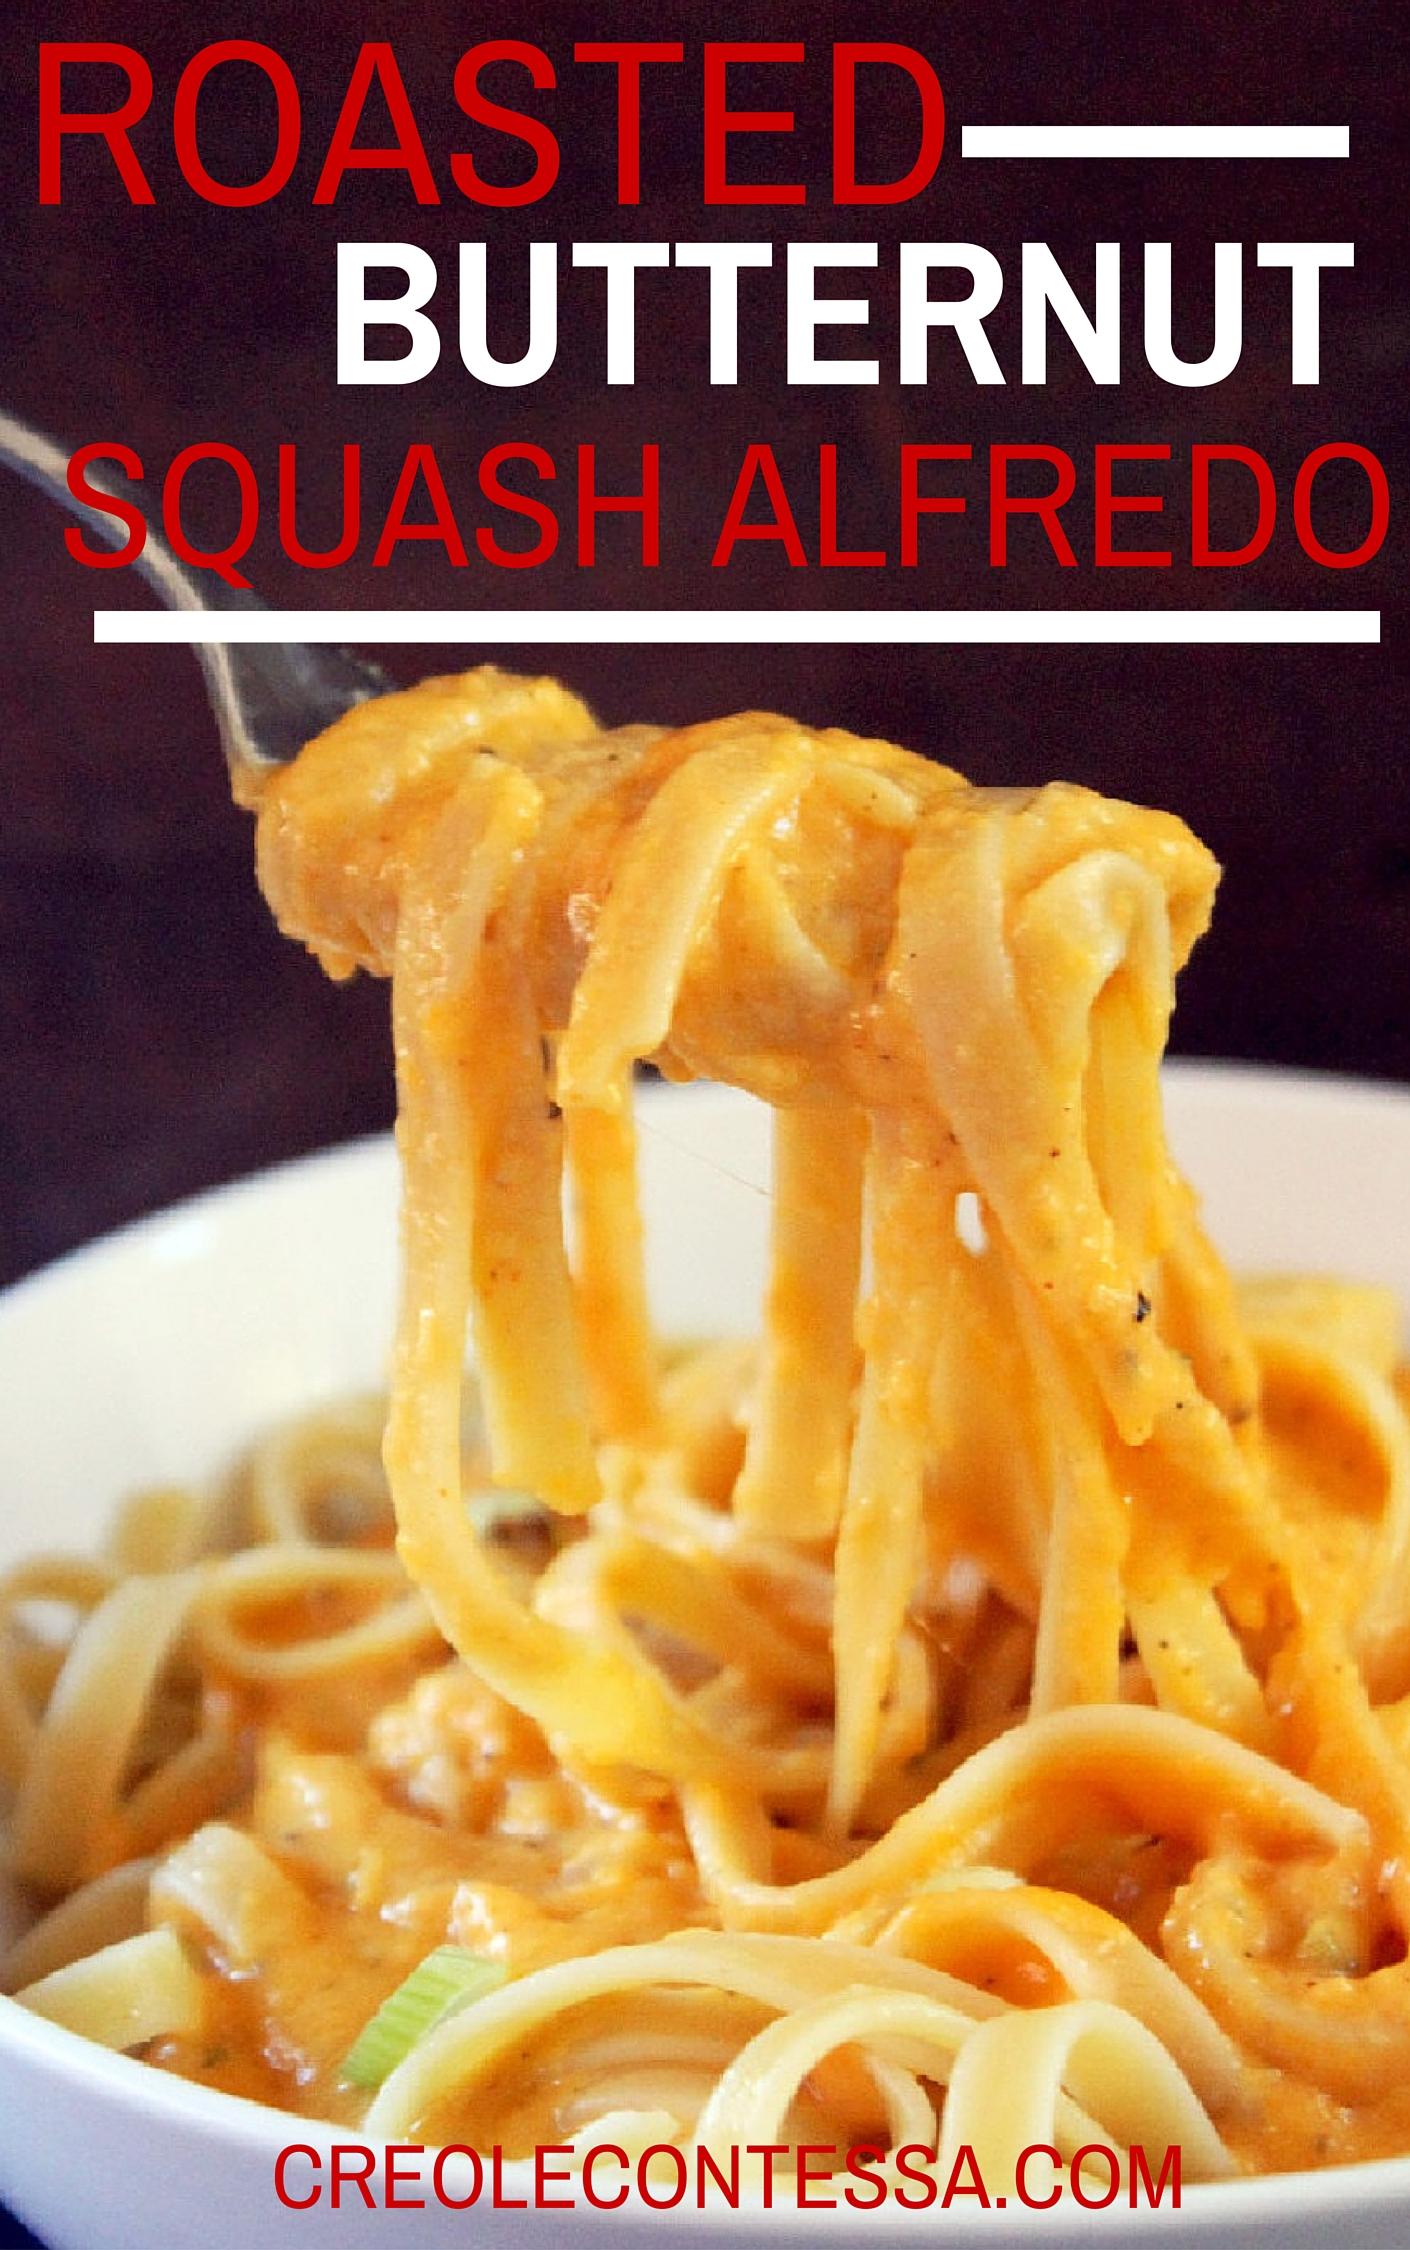 Roasted Butternut Squash Alfredo-Creole Contessa